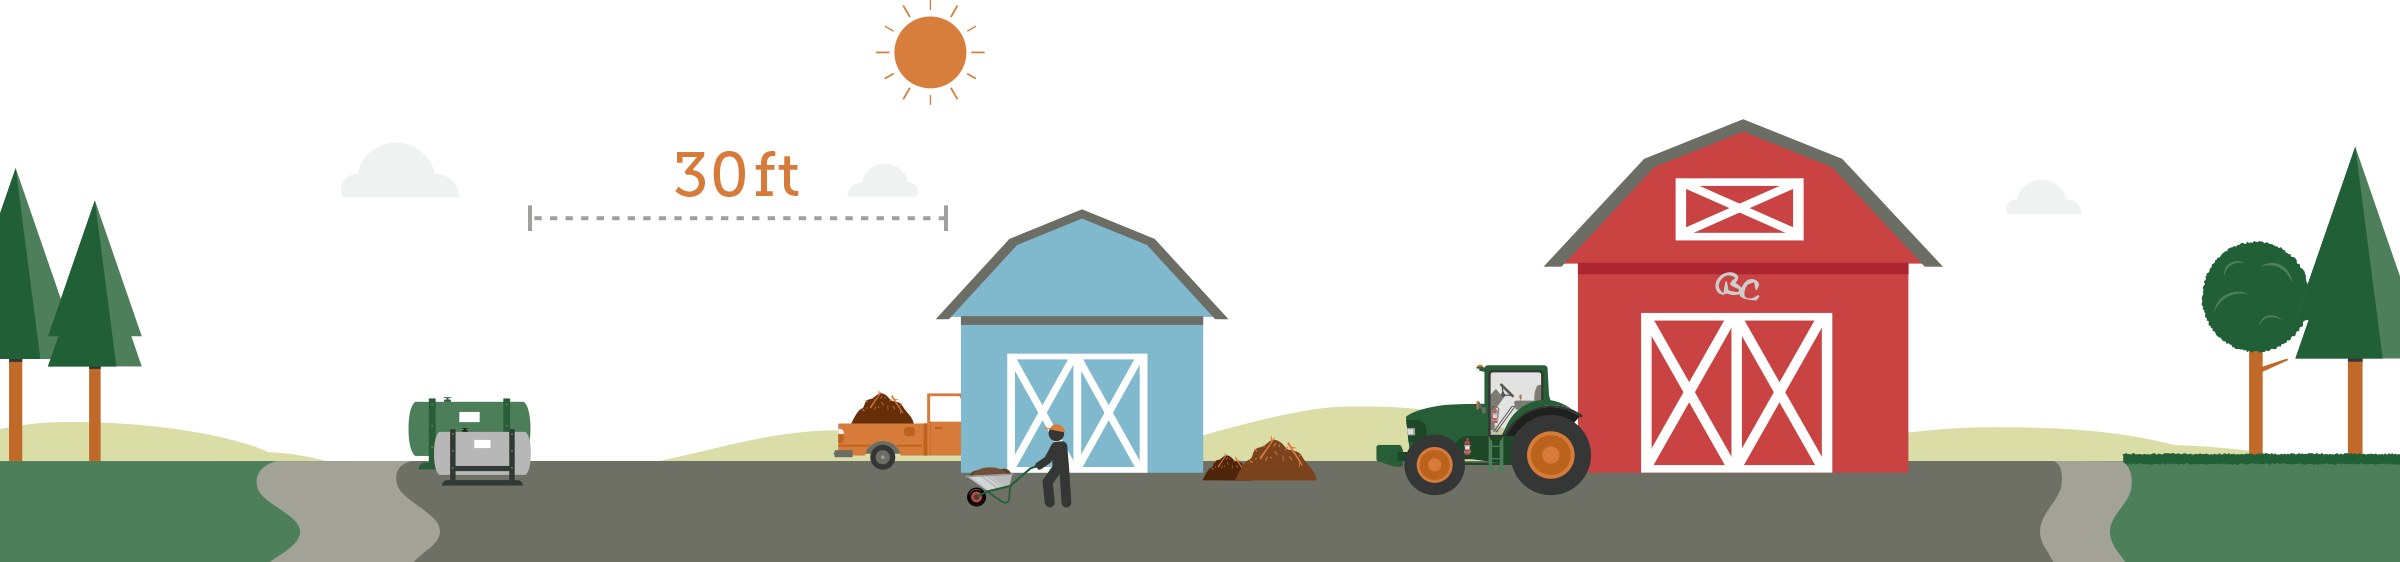 Gate clipart barn. Wildfire farm preparedness basic